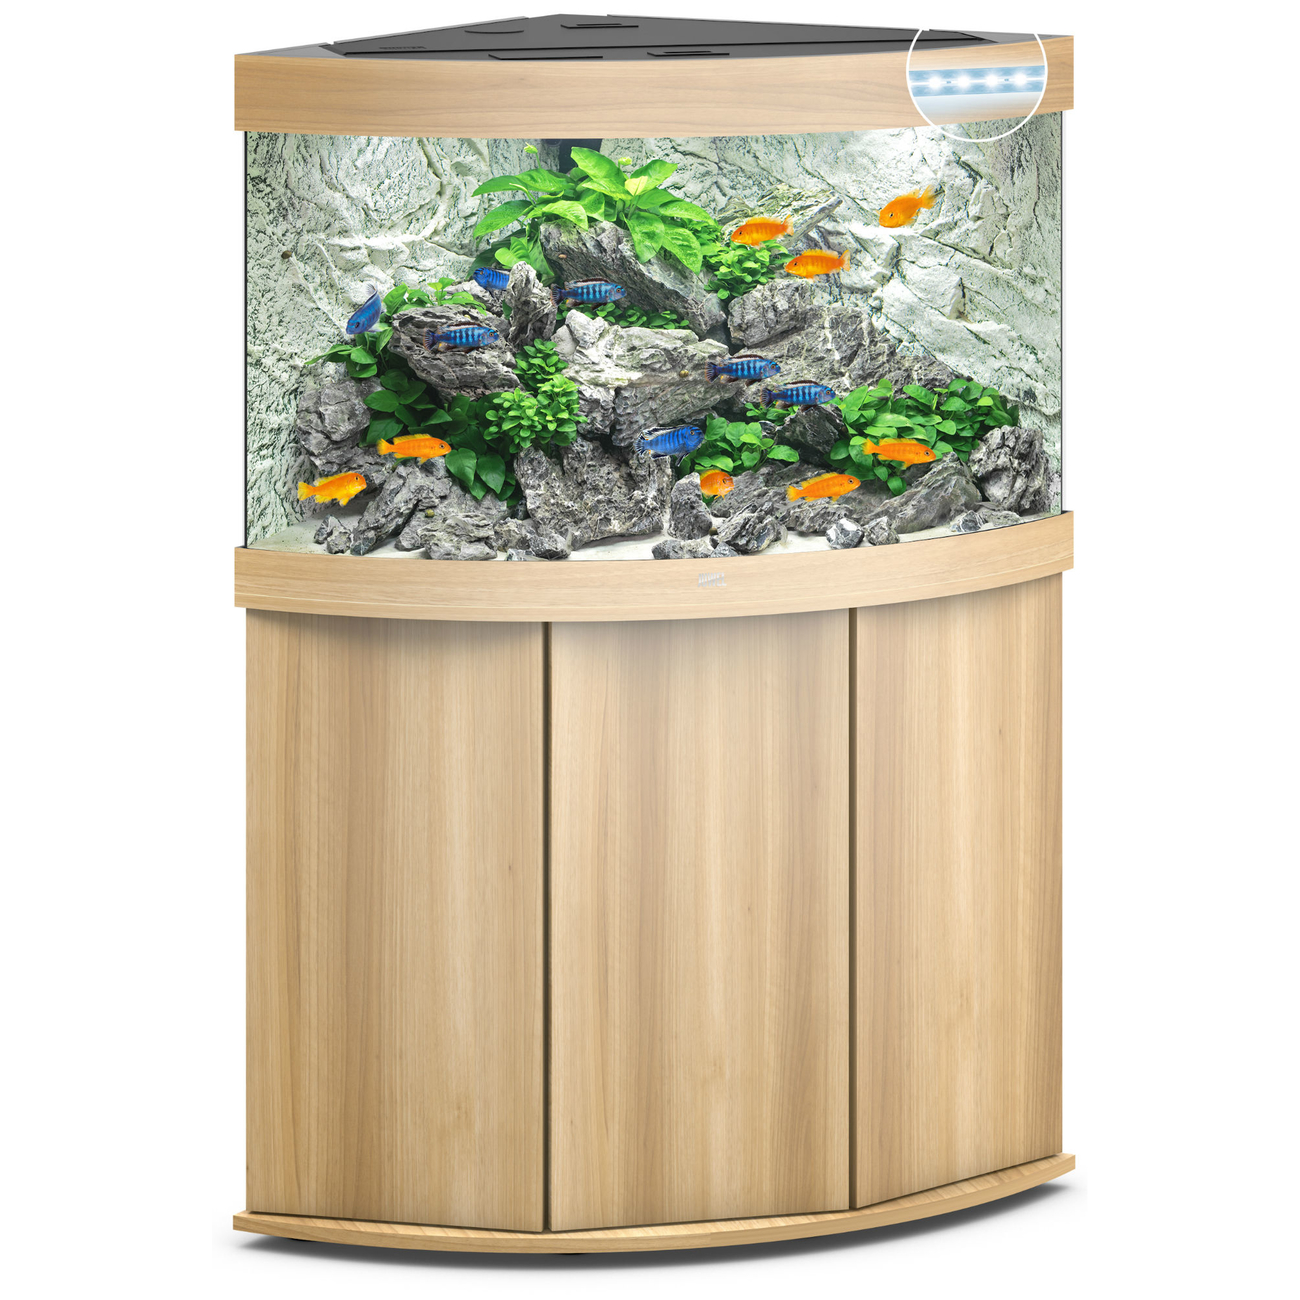 Juwel Trigon 190 LED Eck-Aquarium mit Unterschrank, Bild 11